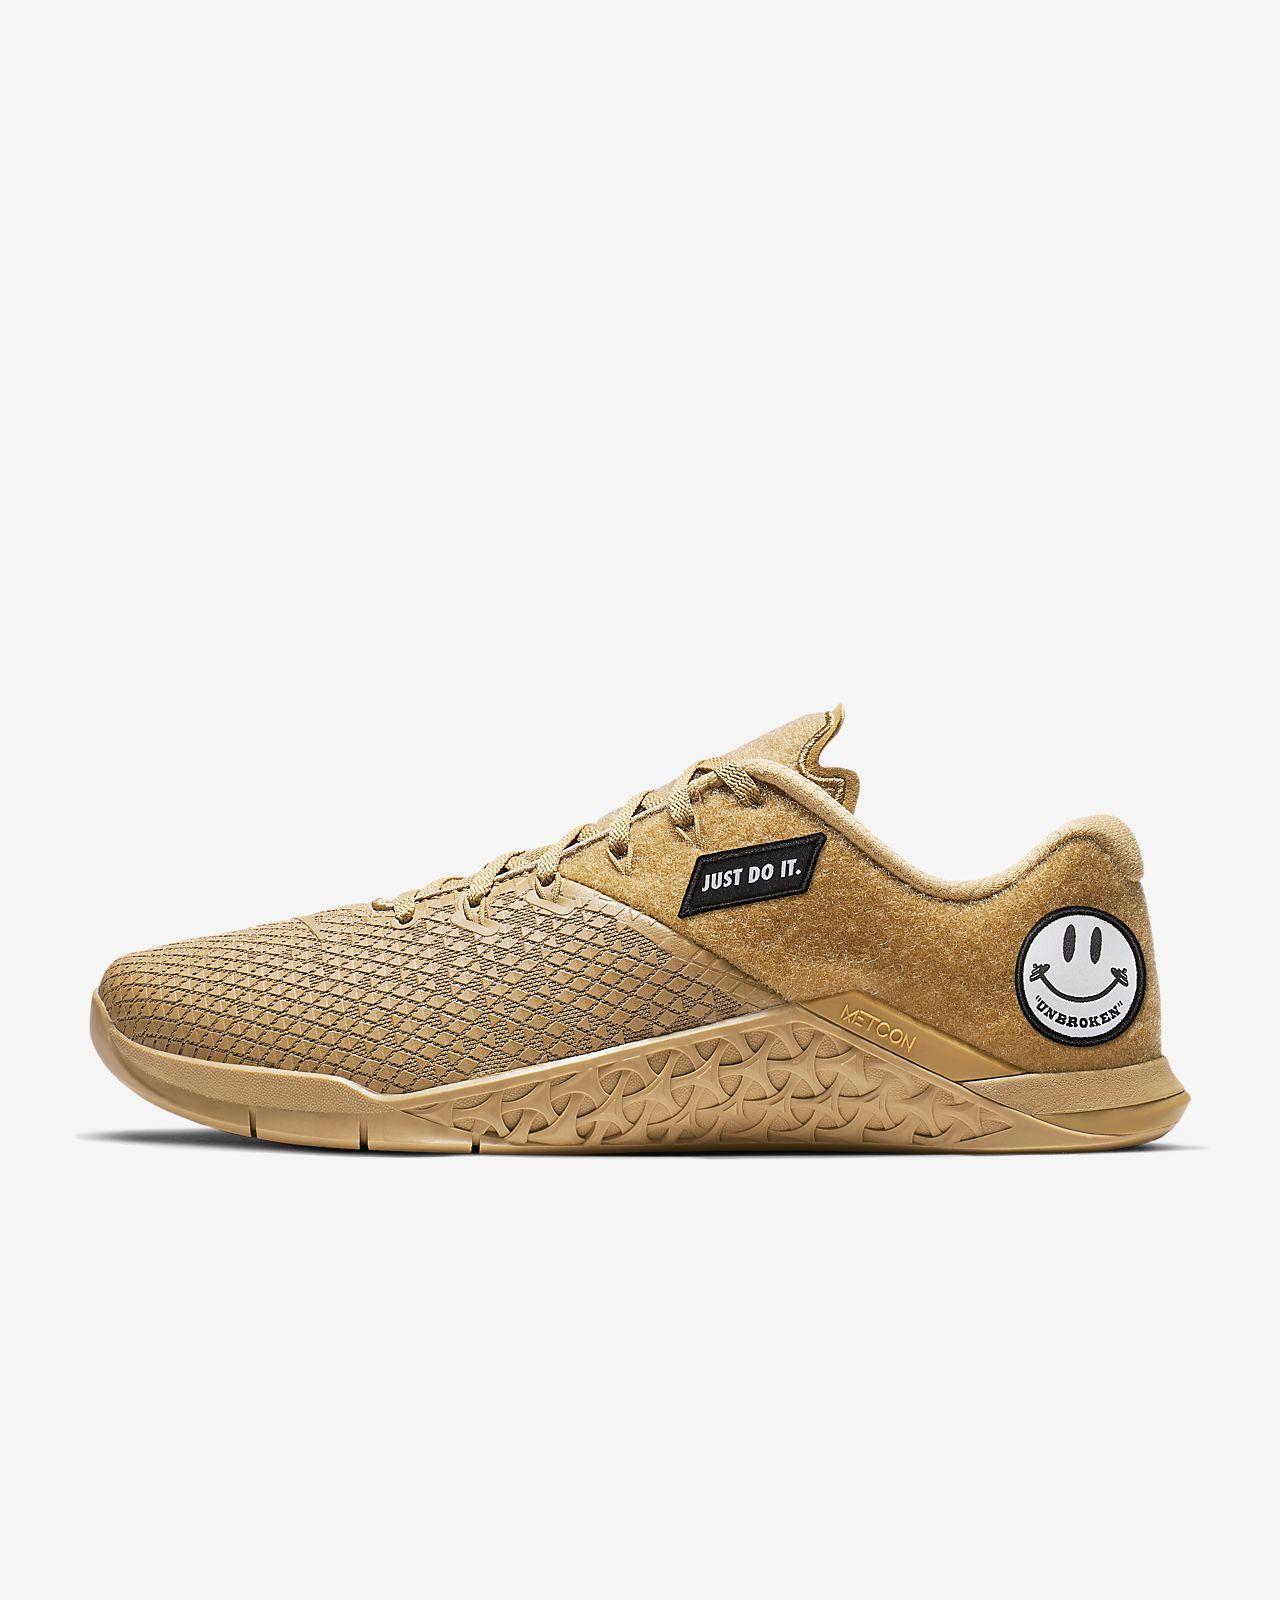 Nike Metcon 4 XD Patch Men's Training Shoe